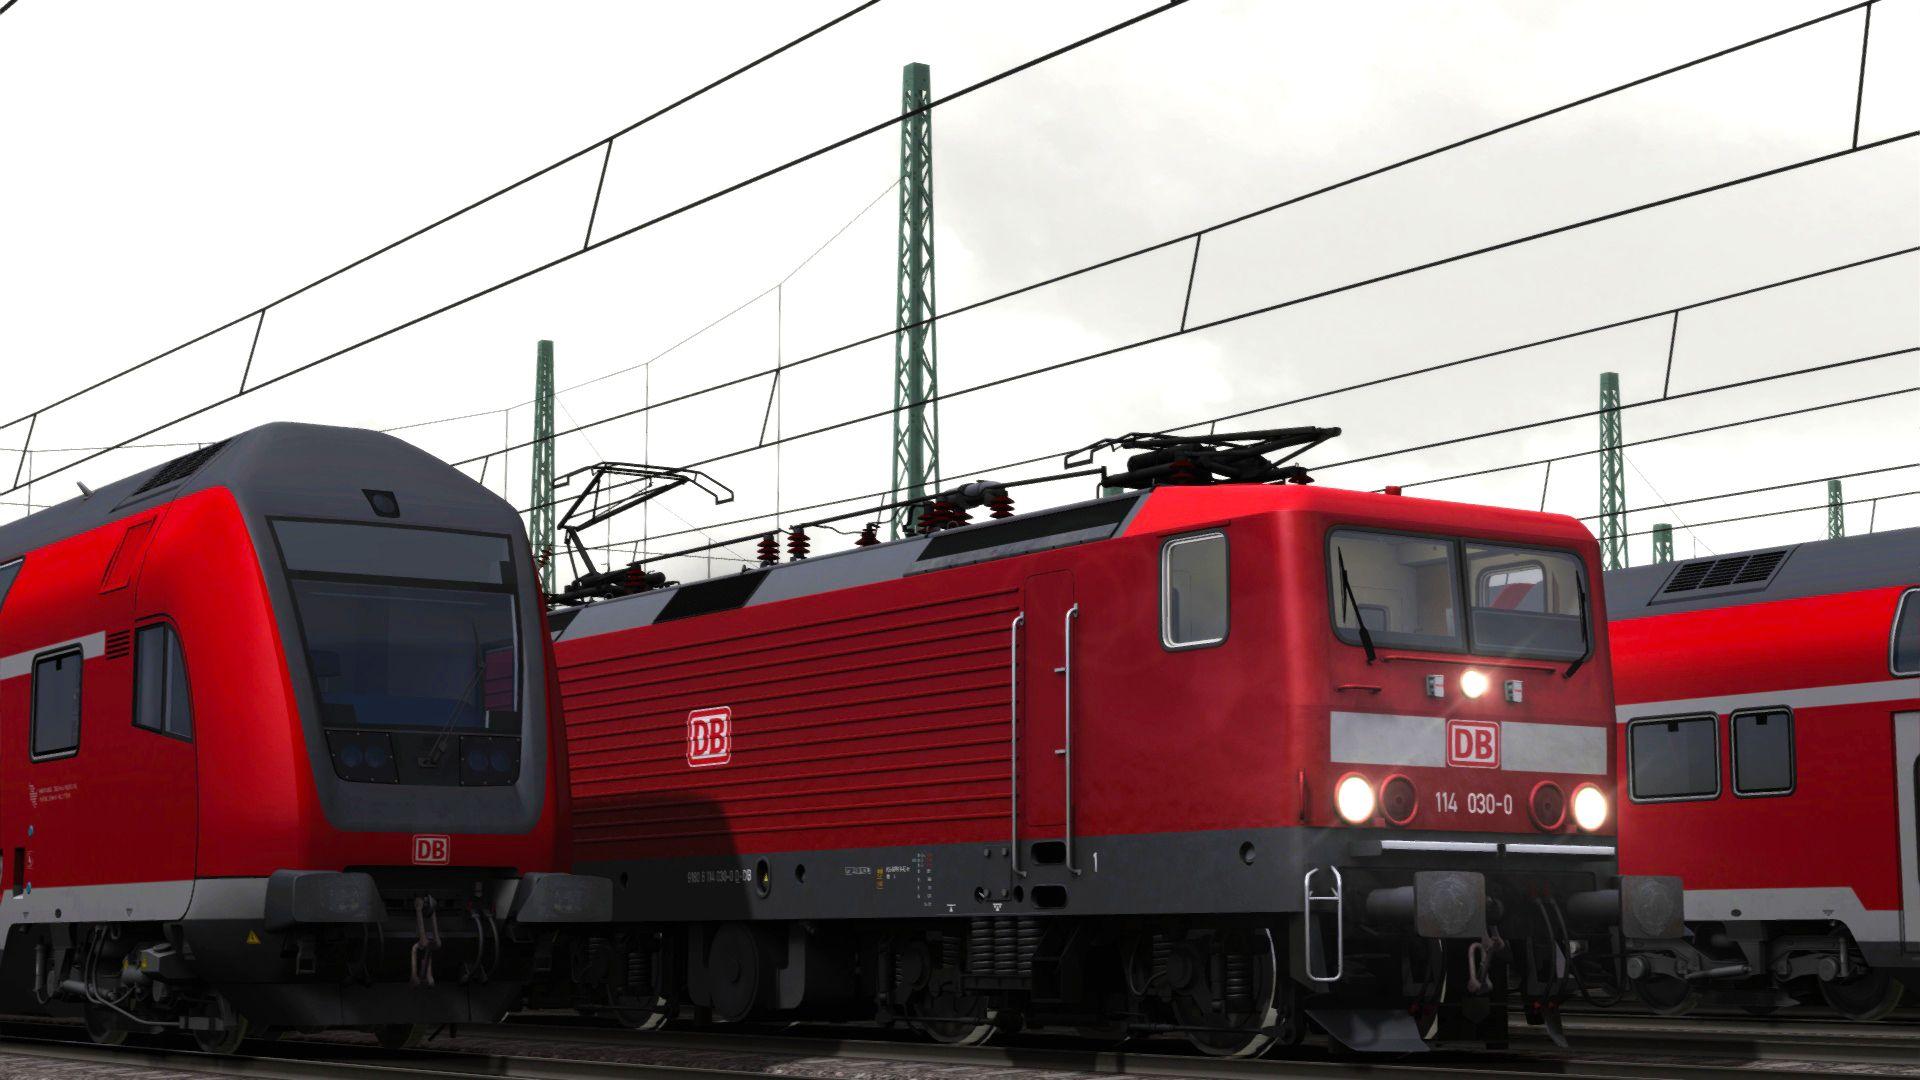 BR1143